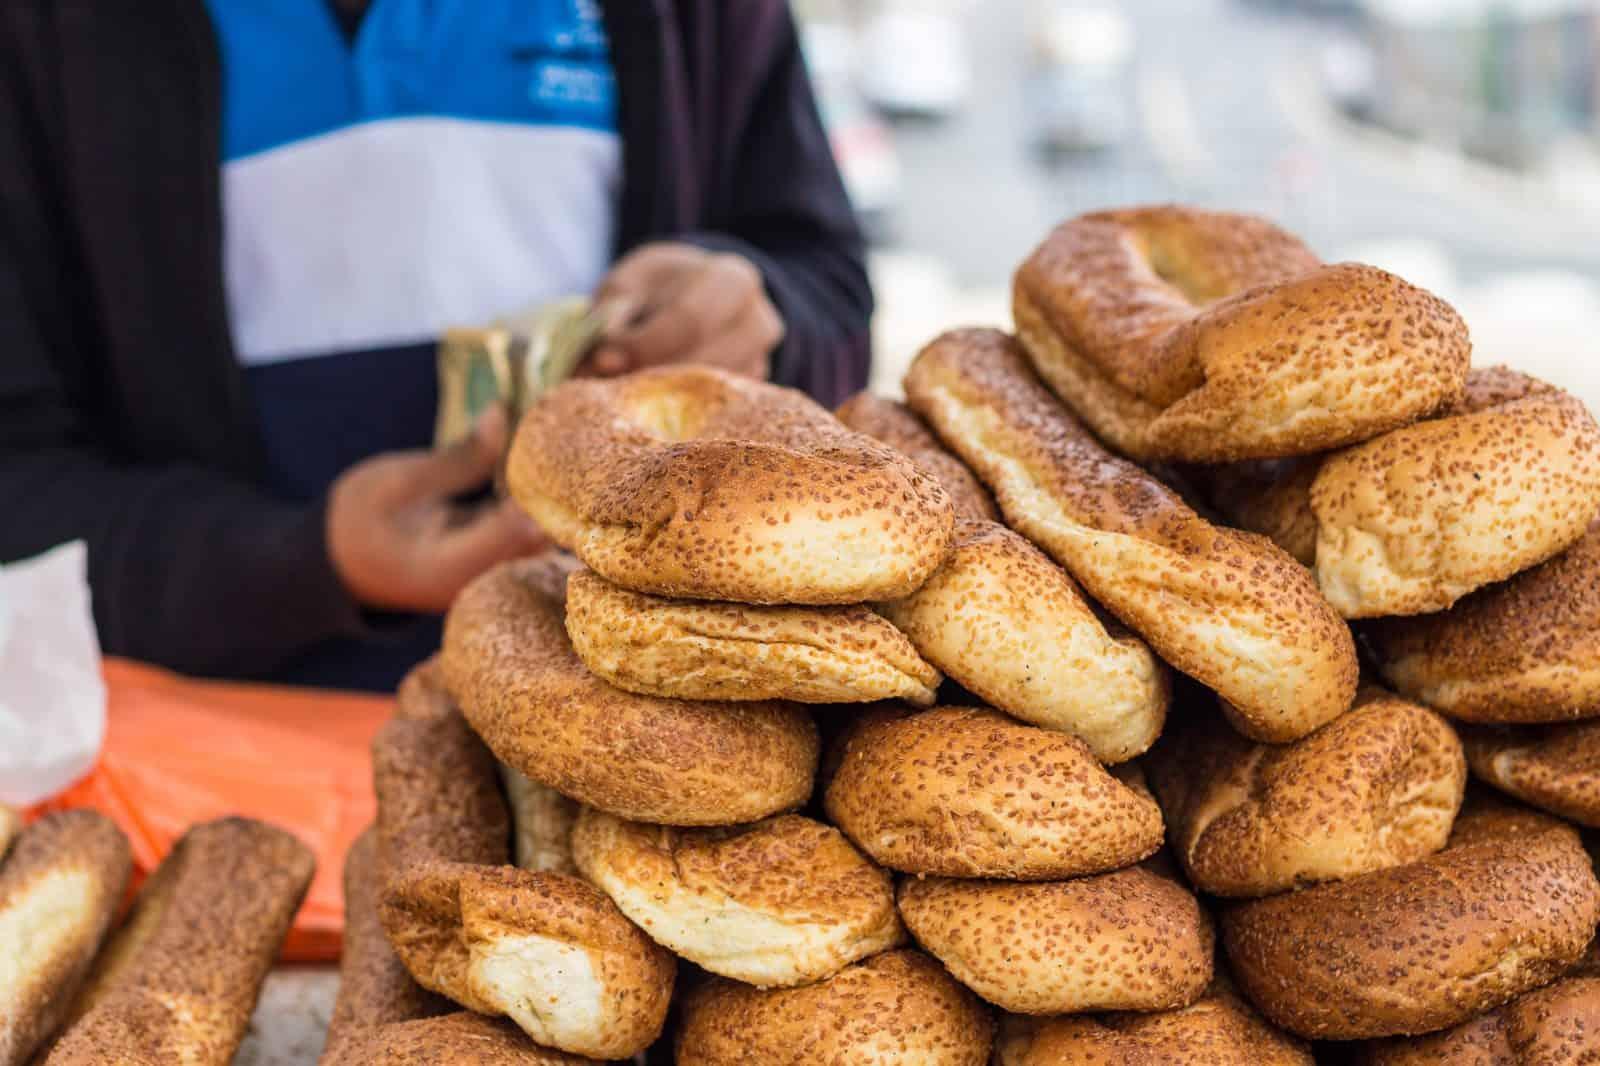 Bread stand in Jerusalem